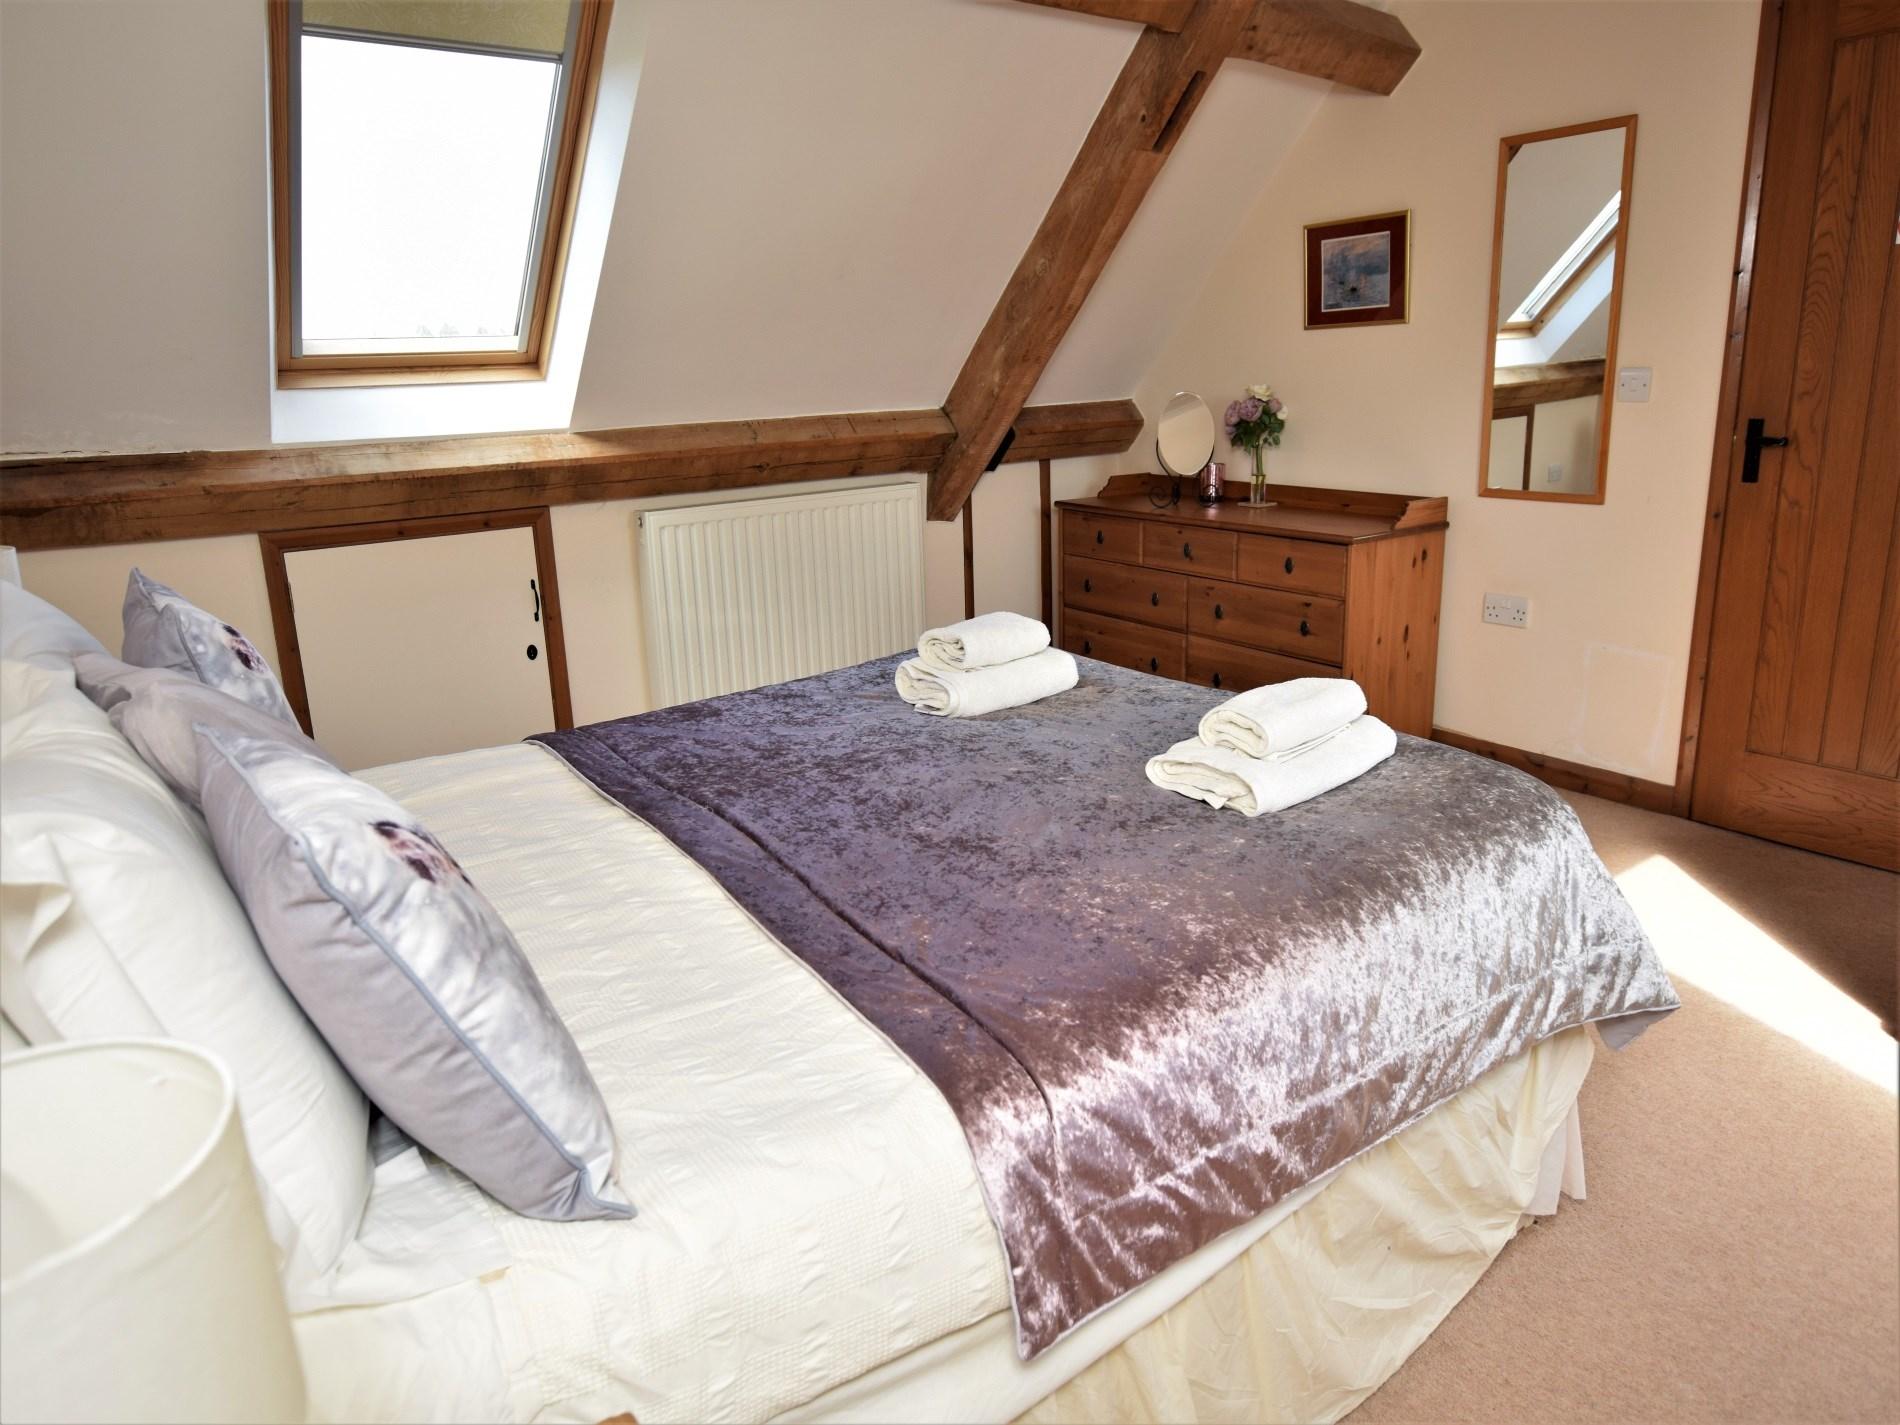 King size bedroom on the top floor